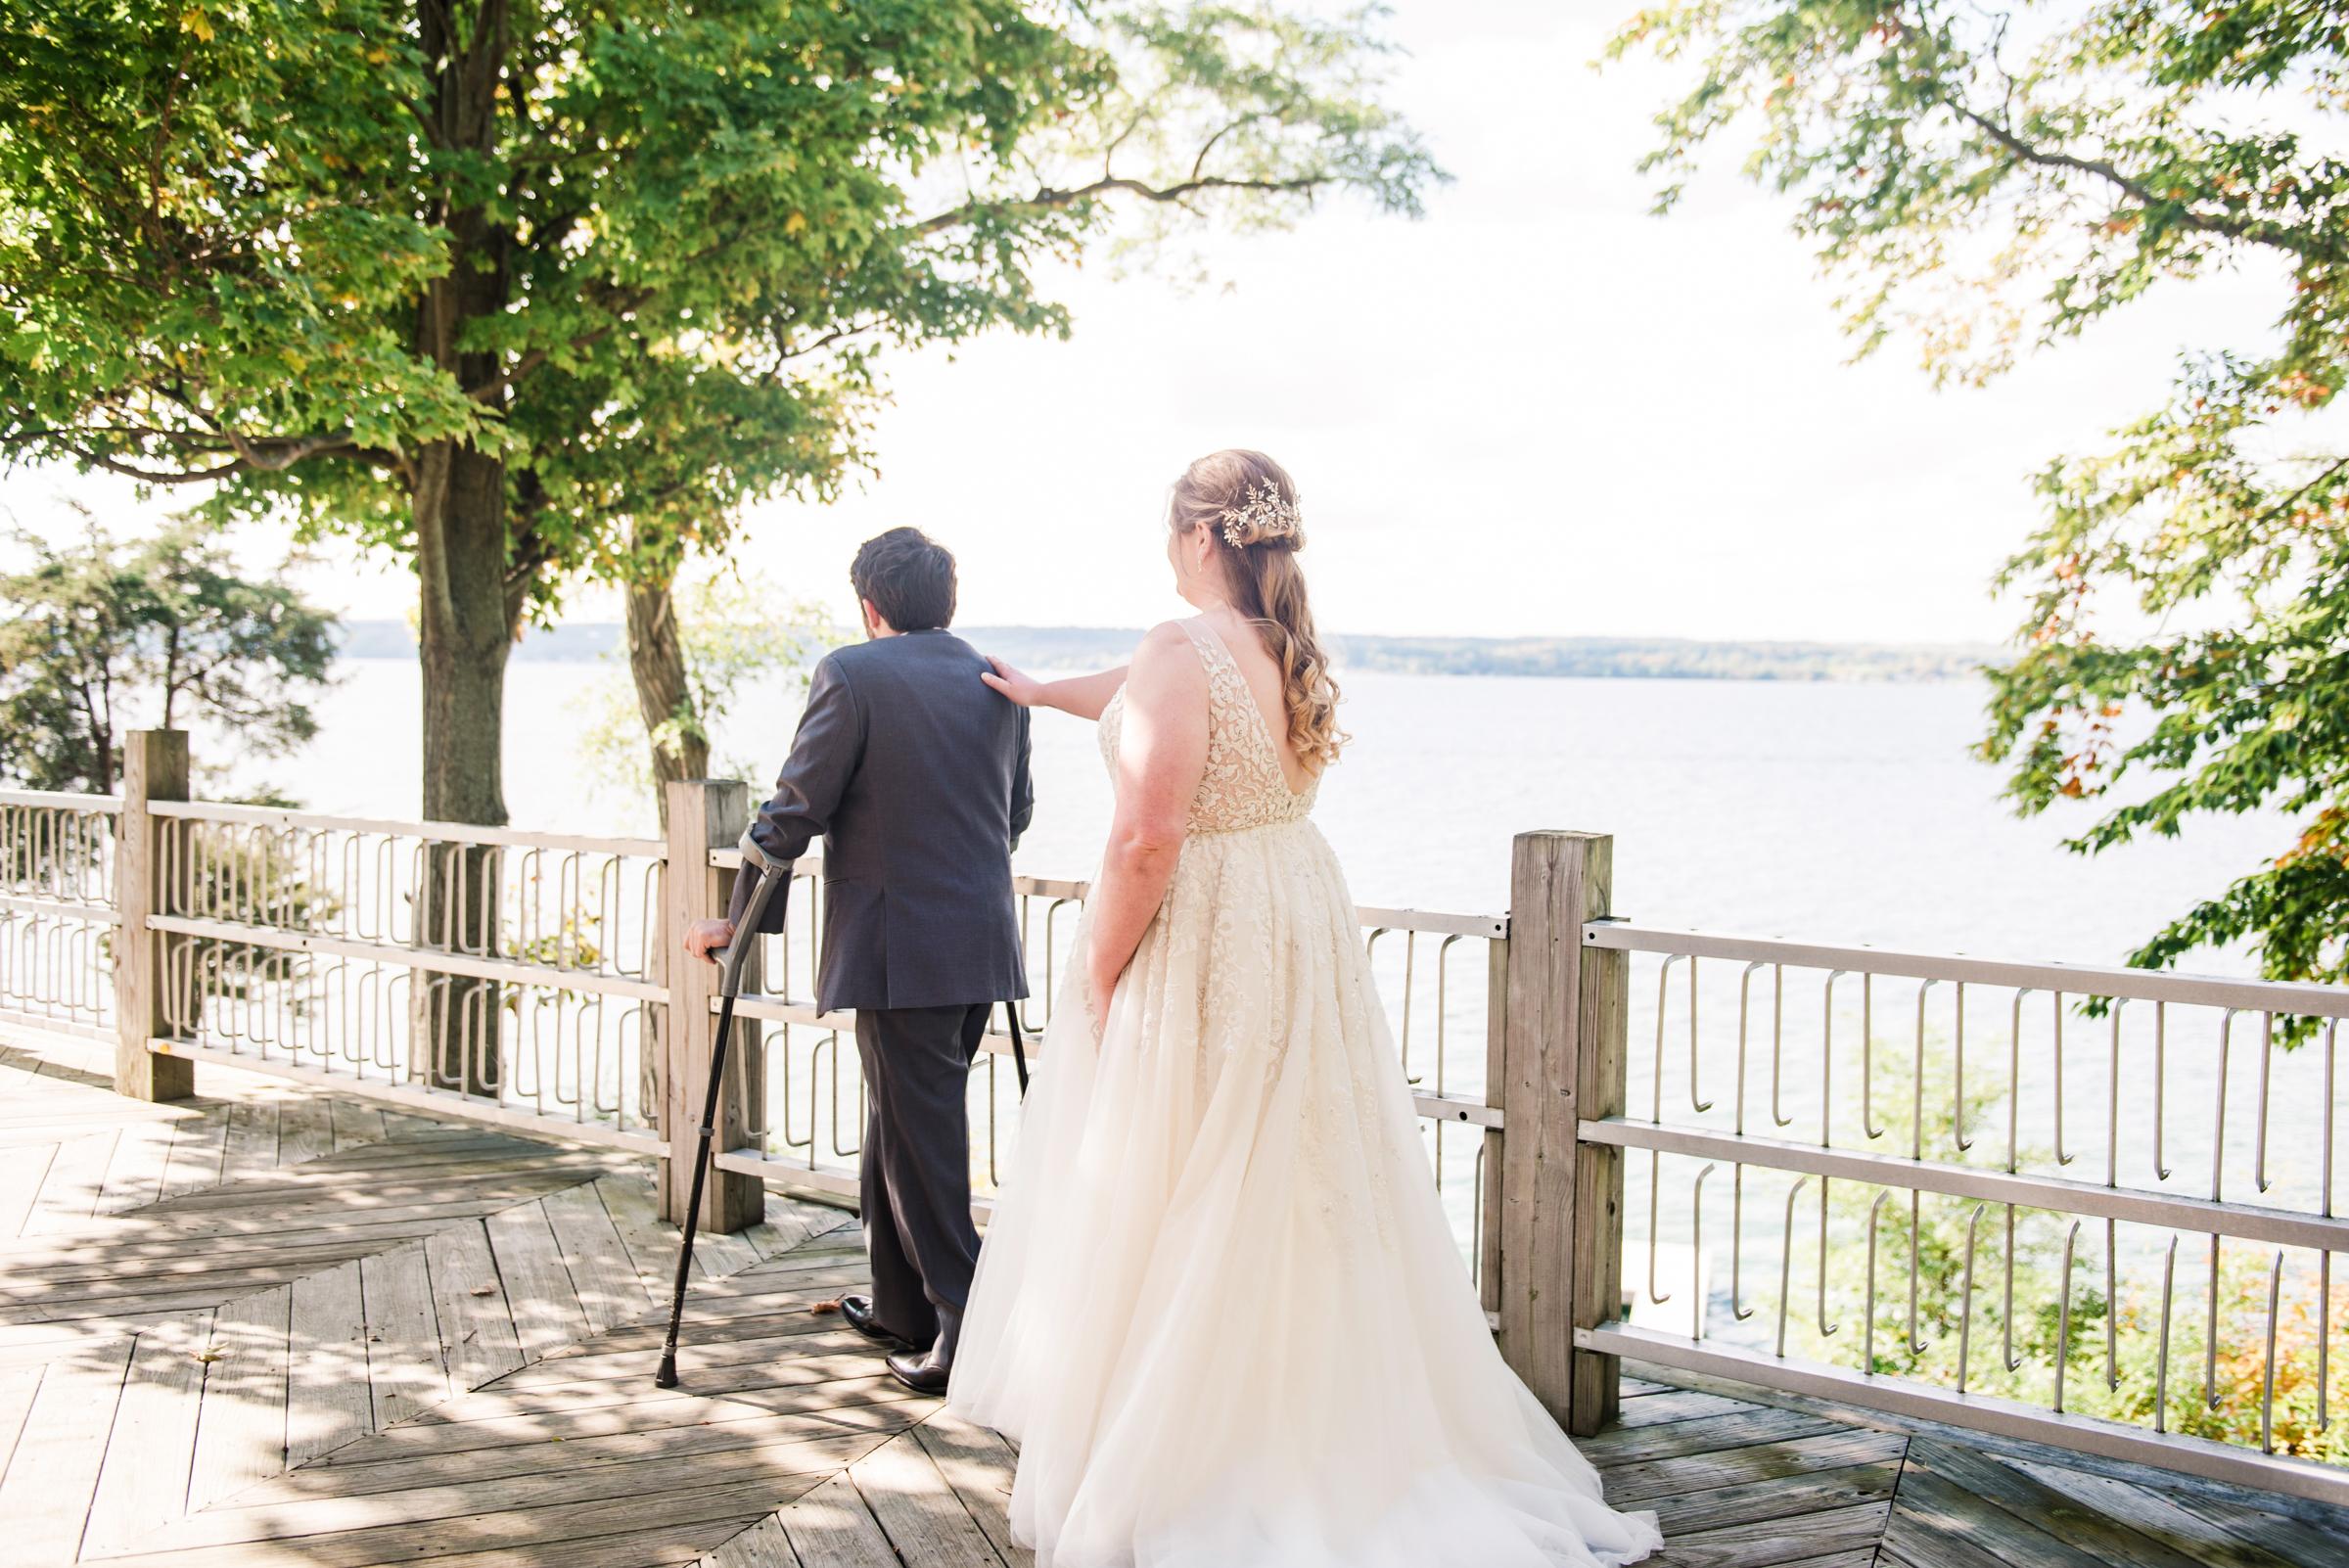 Zugibe_Vineyards_Finger_Lakes_Wedding_JILL_STUDIO_Rochester_NY_Photographer_DSC_3434.jpg